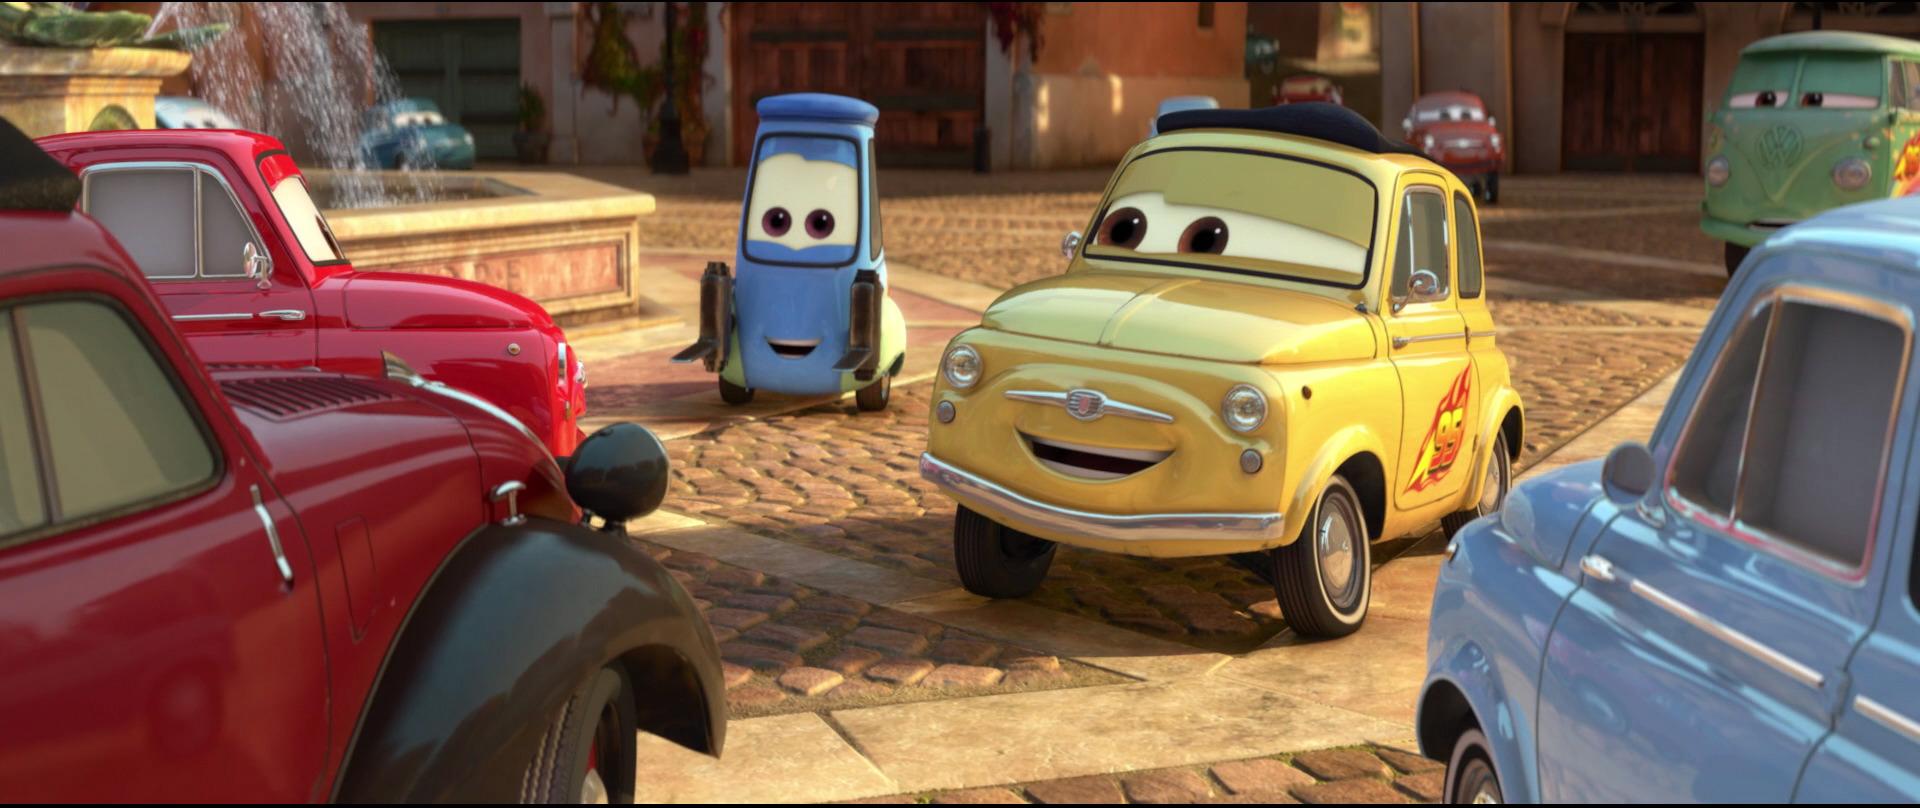 Image - Cars2-disneyscreencaps.com-6521.jpg | Heroes Wiki ...